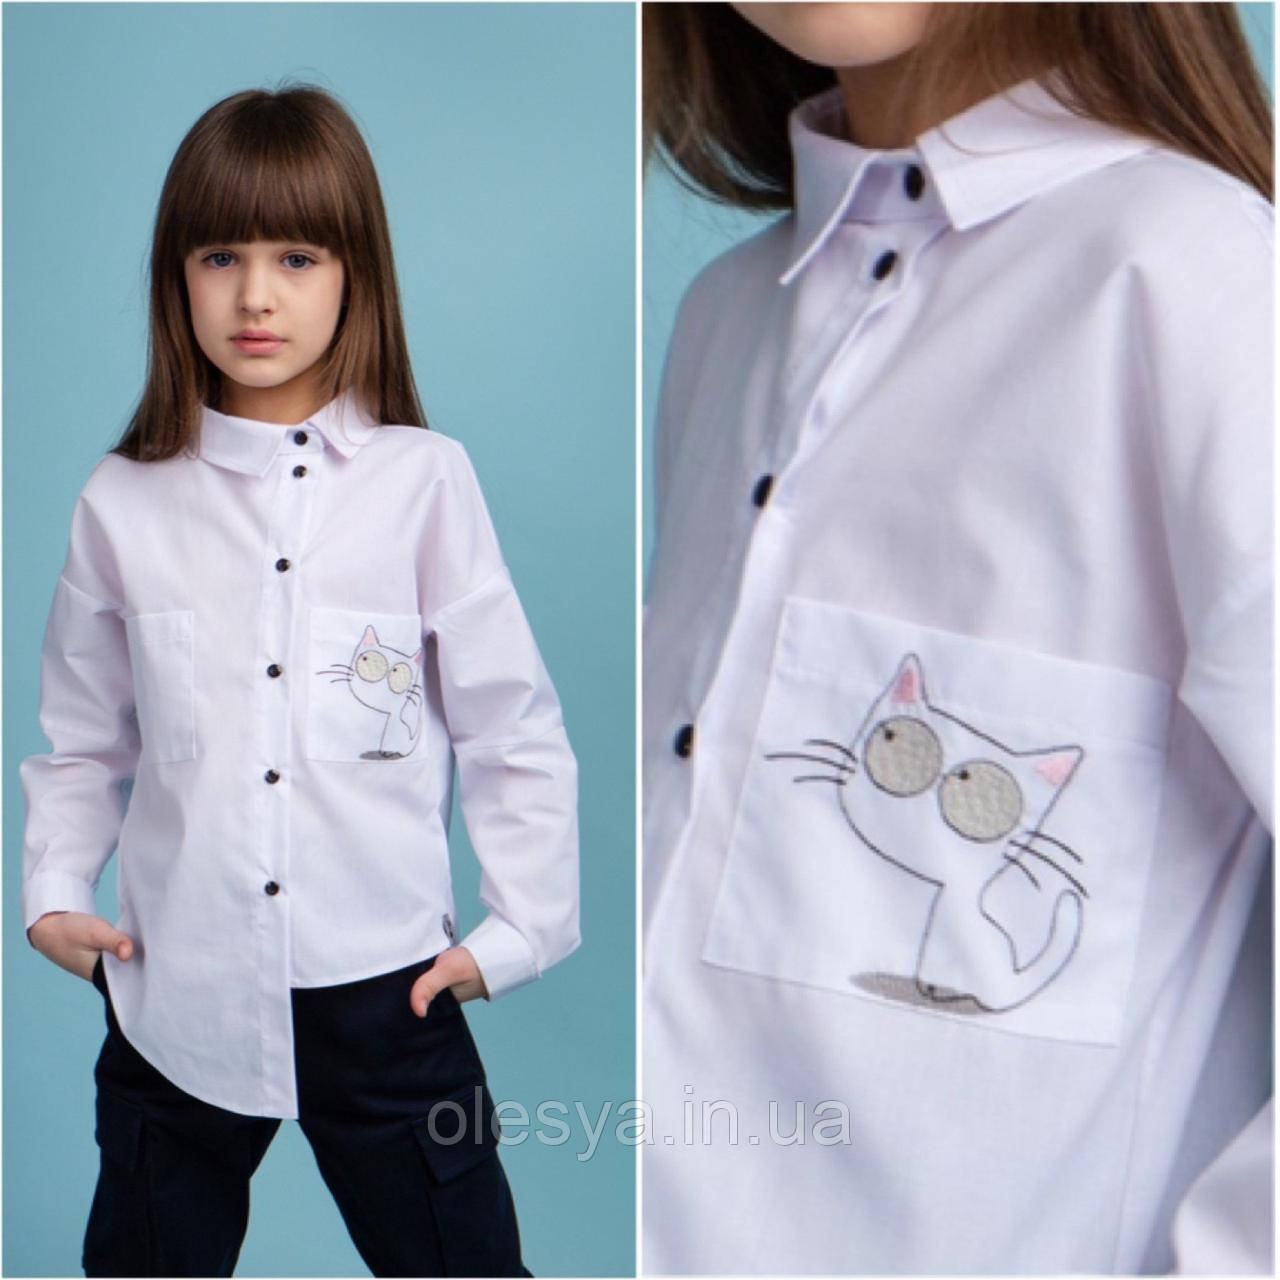 Блуза школьная для девочек Catlinn ТМ BrilliAnt Размеры 128- 158 цвет белый